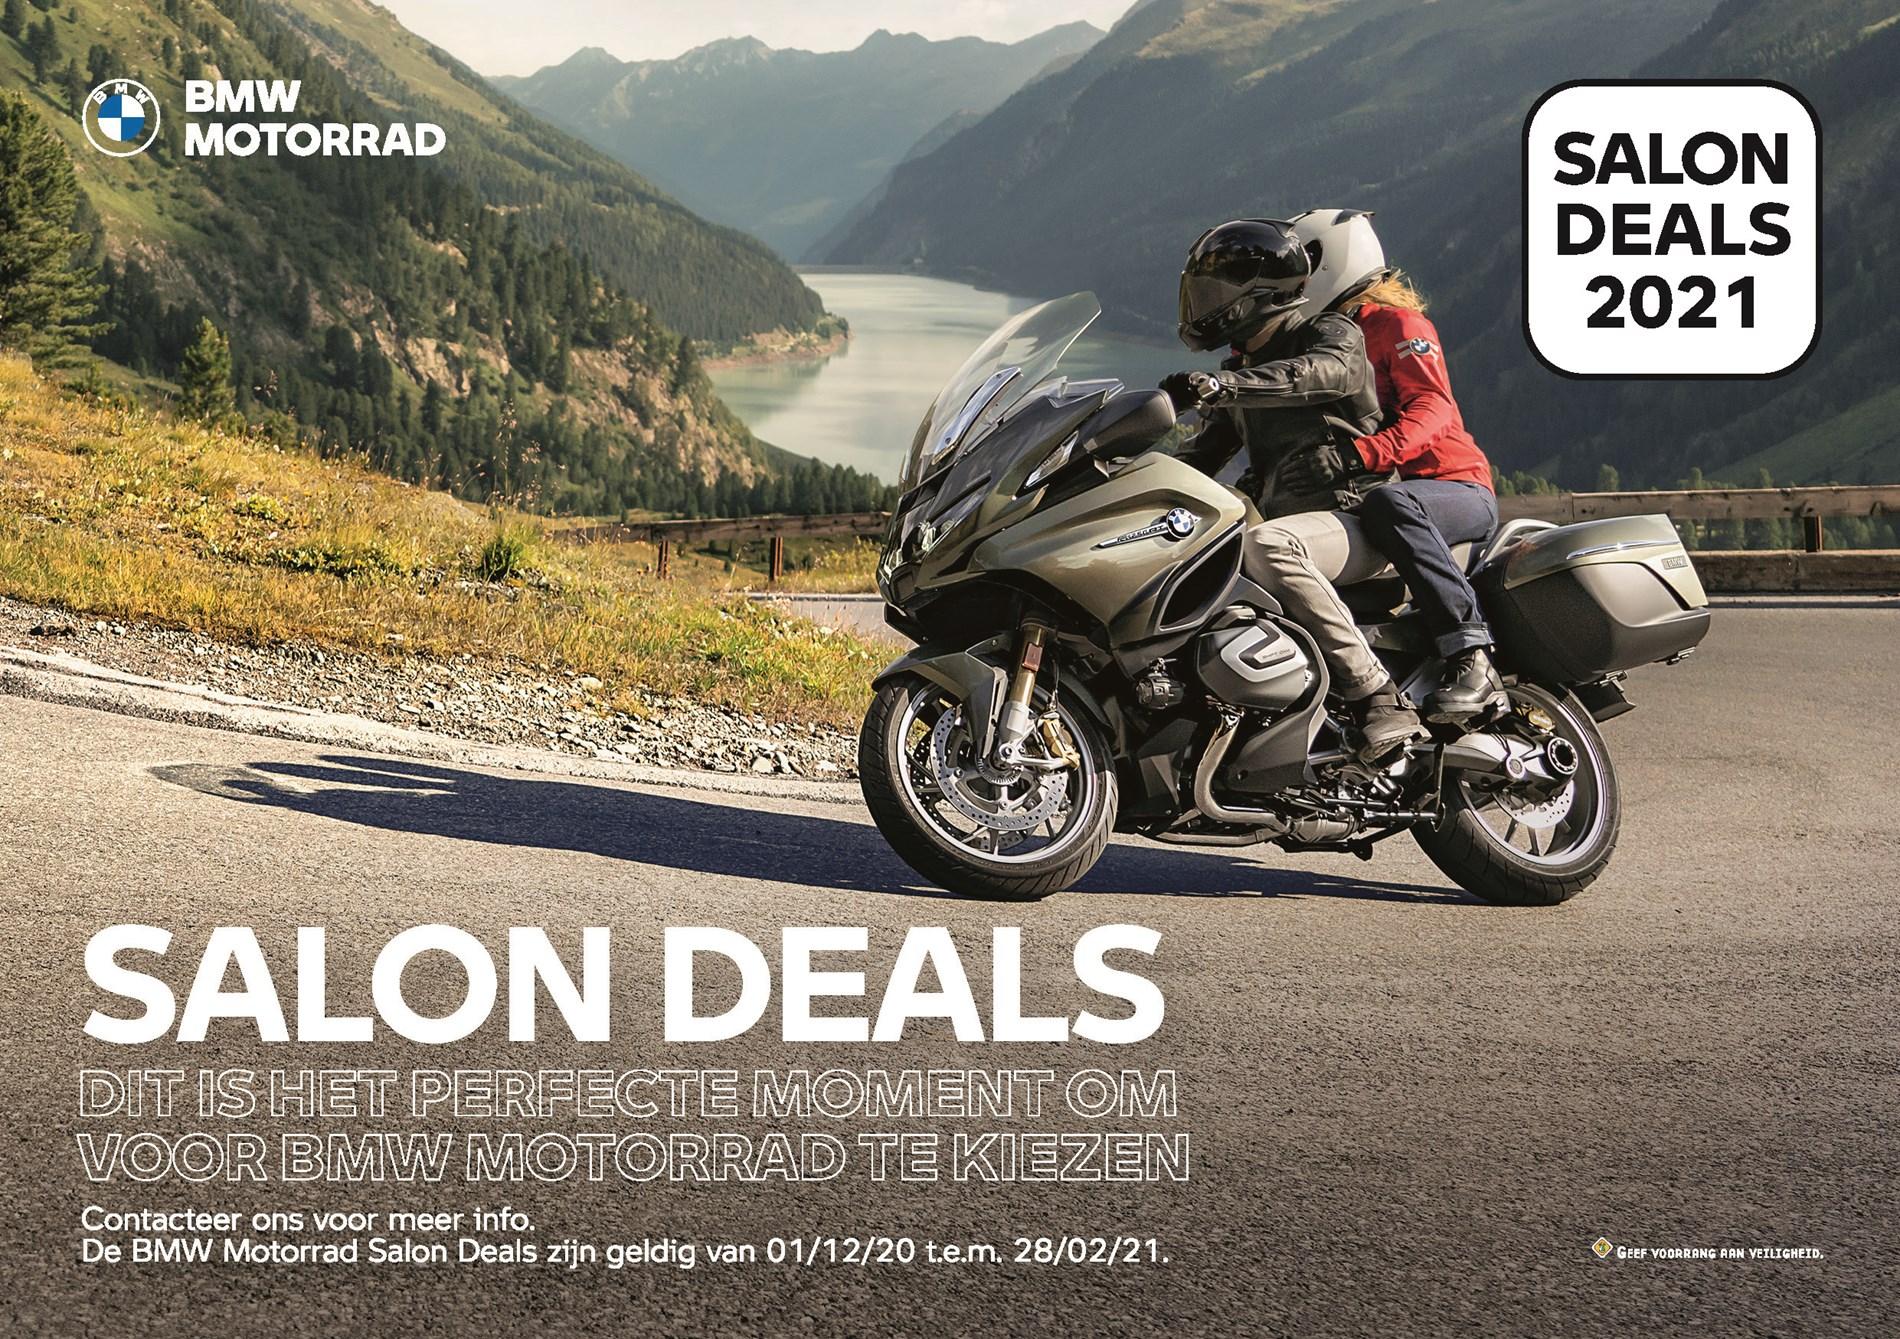 BMW MOTORRAD SALON DEALS.